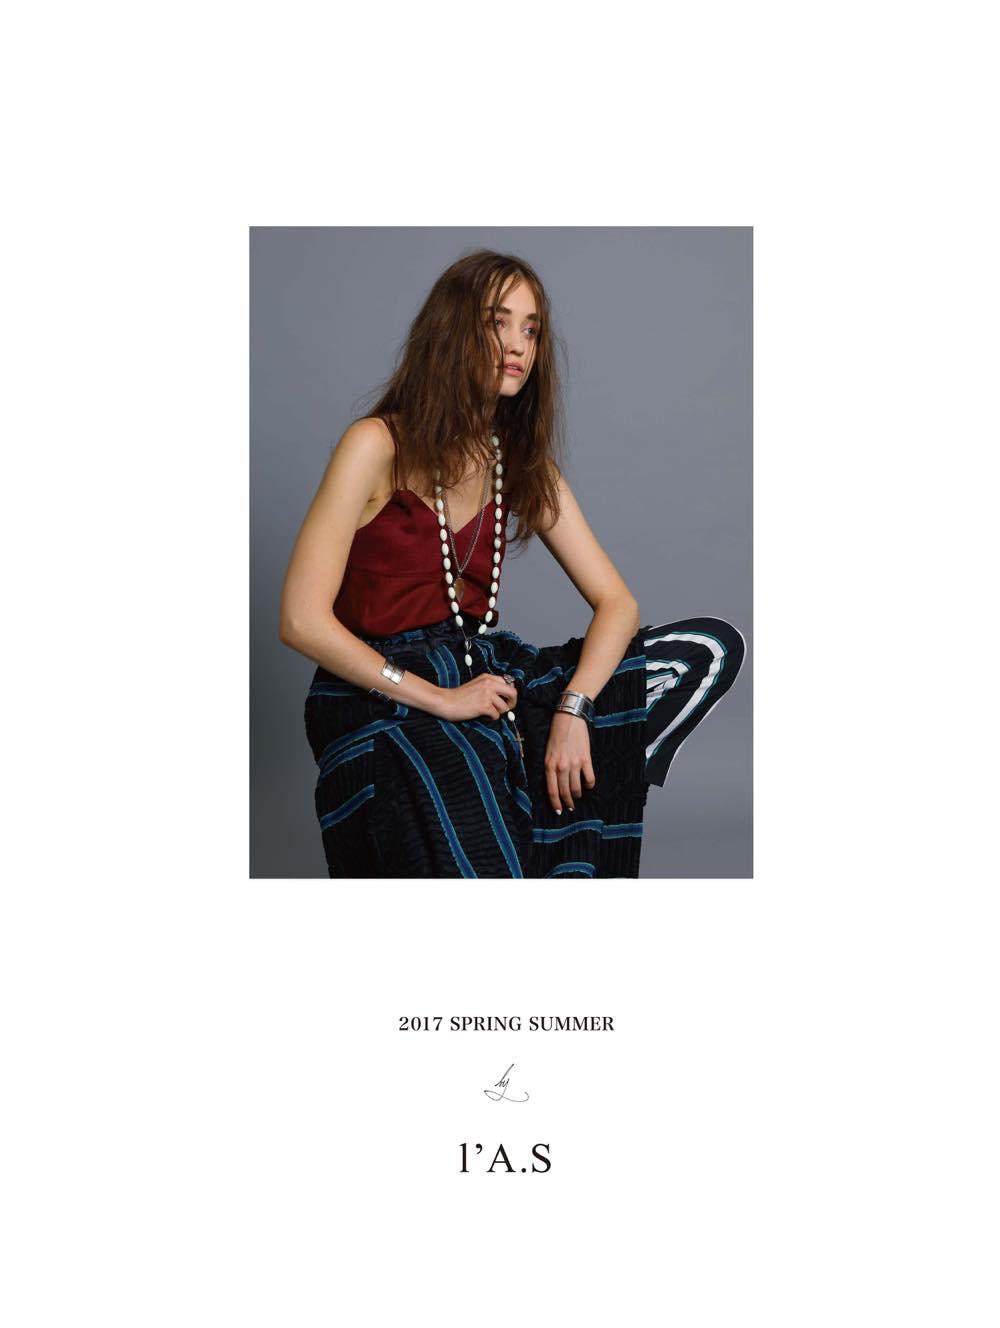 l'A.S(ラス)2017年春夏 コレクション。デザイナーは猿橋 歩美(Ayumi Saruhashi)。